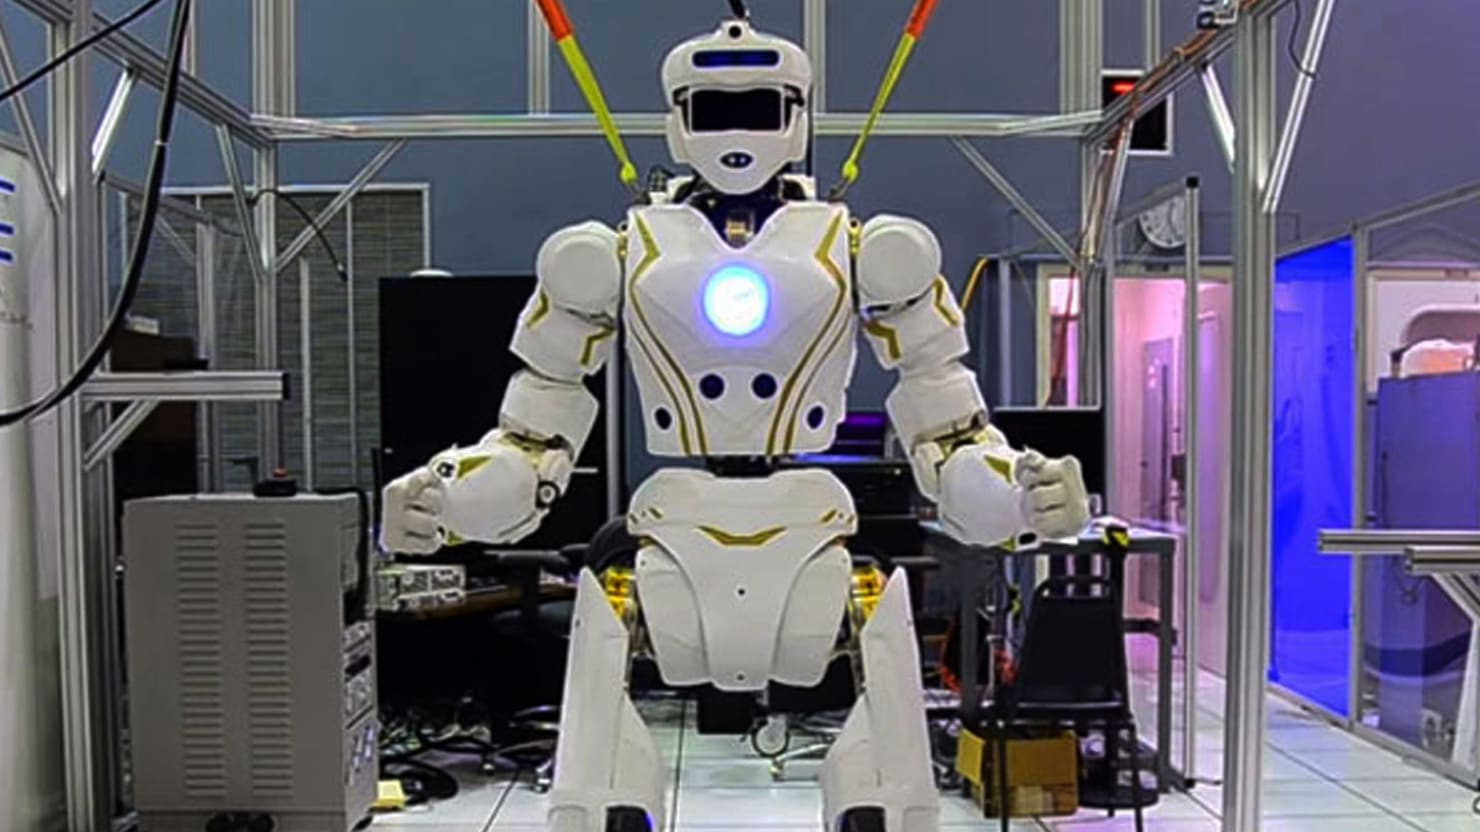 The Humanoid Robot Space Explorer